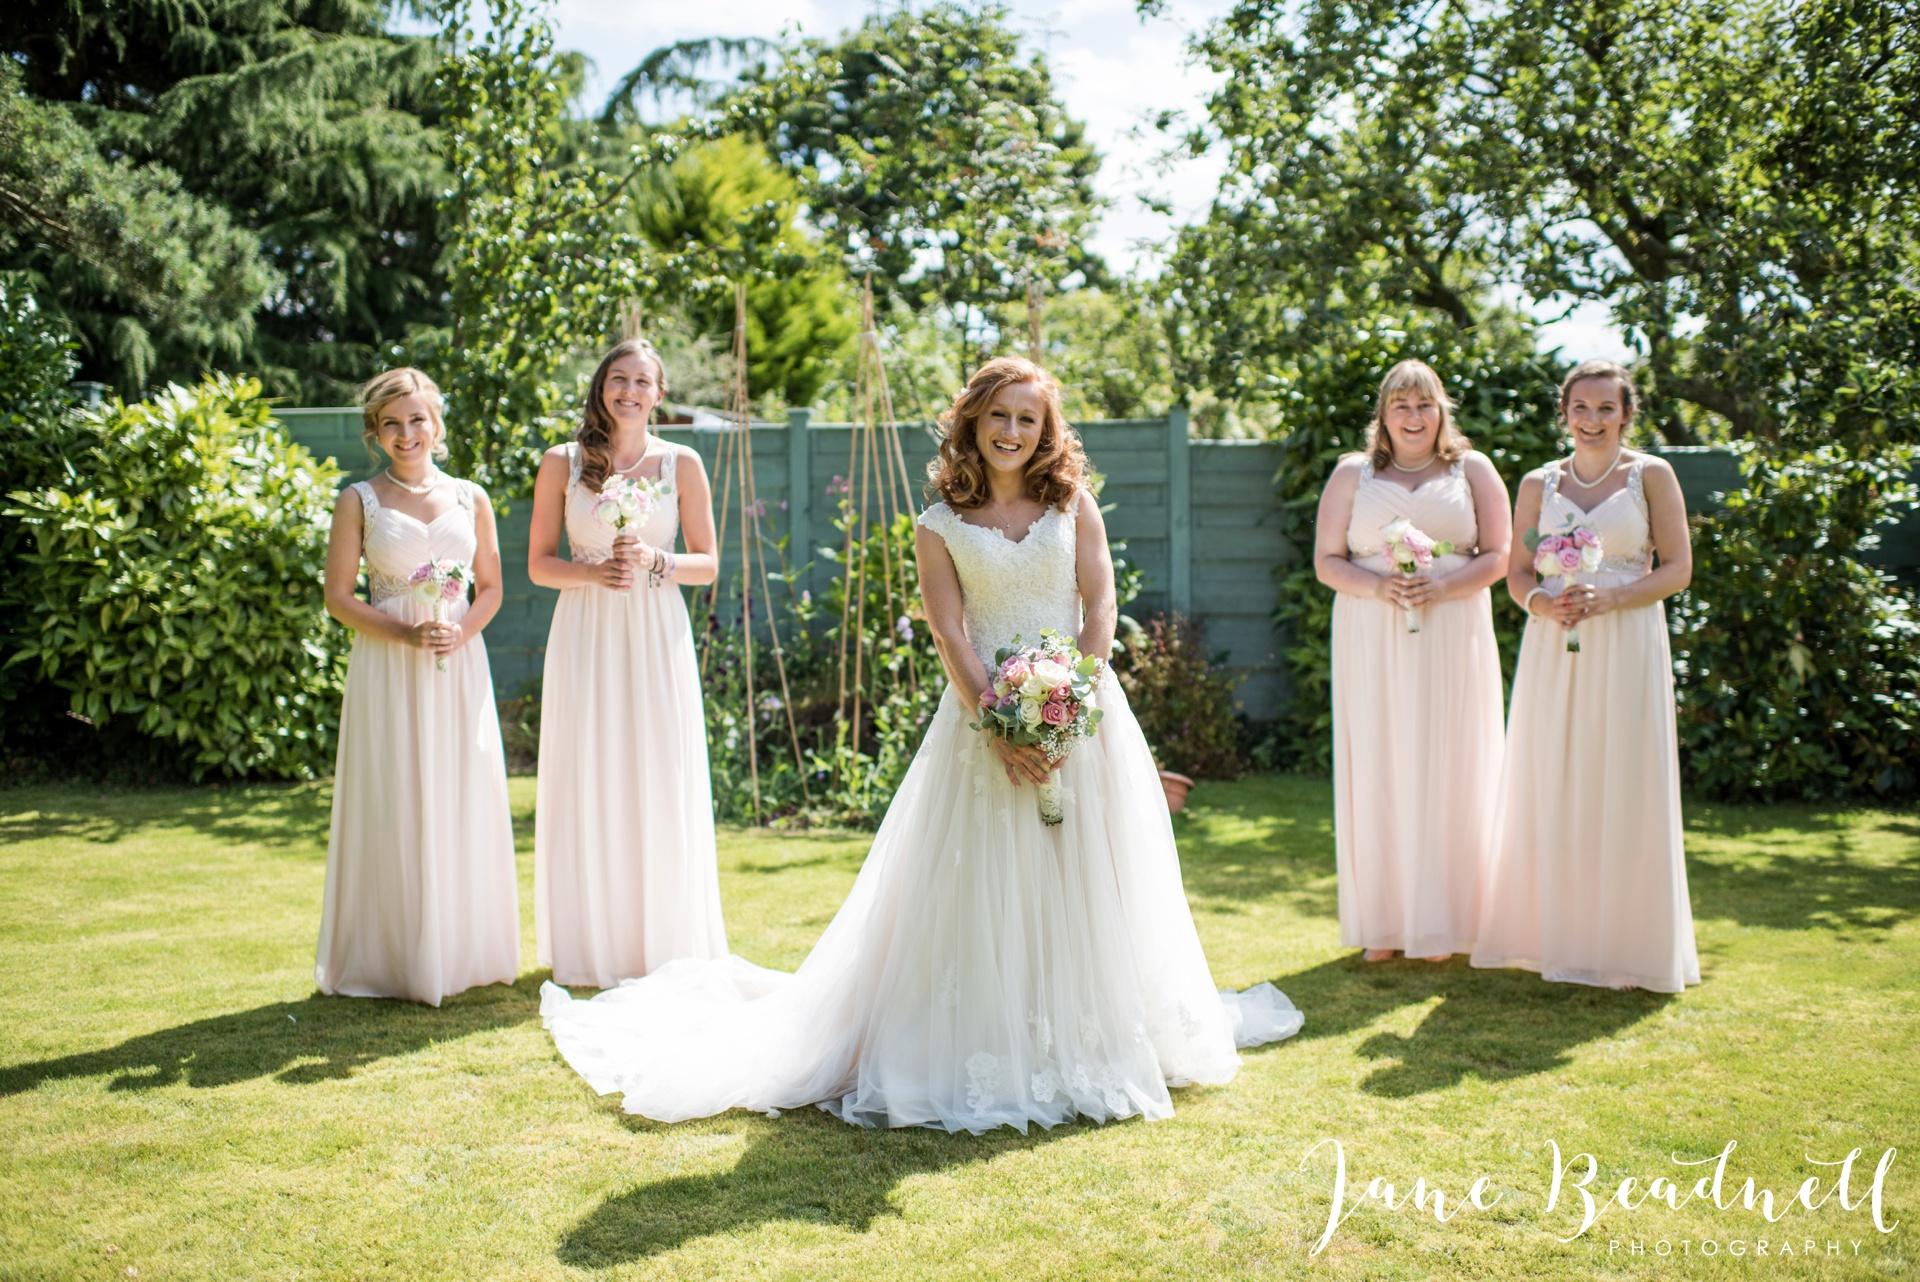 yorkshire-fine-art-wedding-photographer-jane-beadnell-photography-poppleton-york_0015